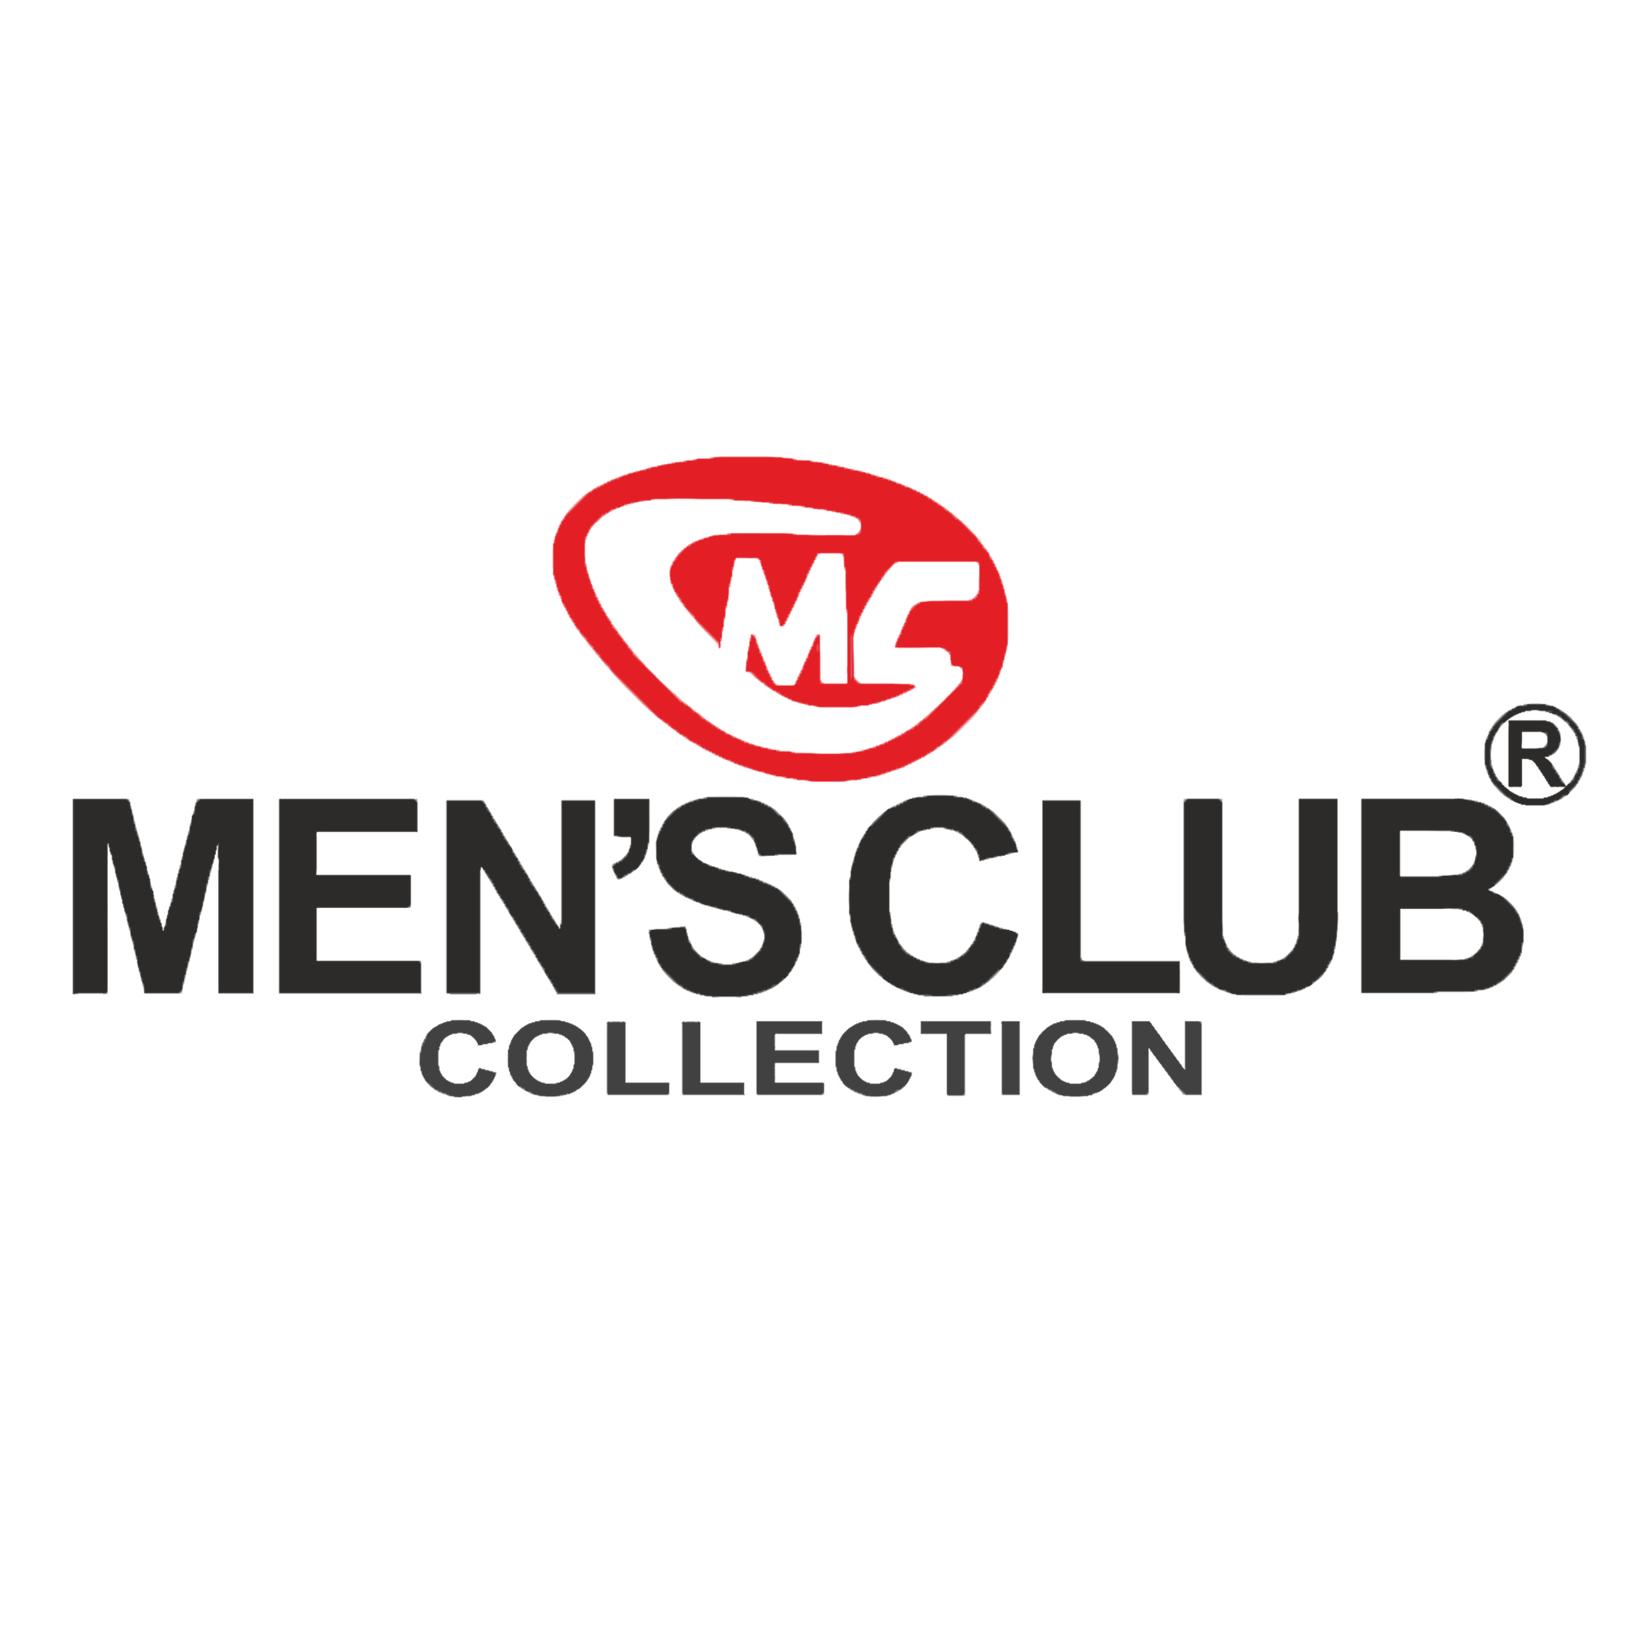 مينز كلوب Men's Club